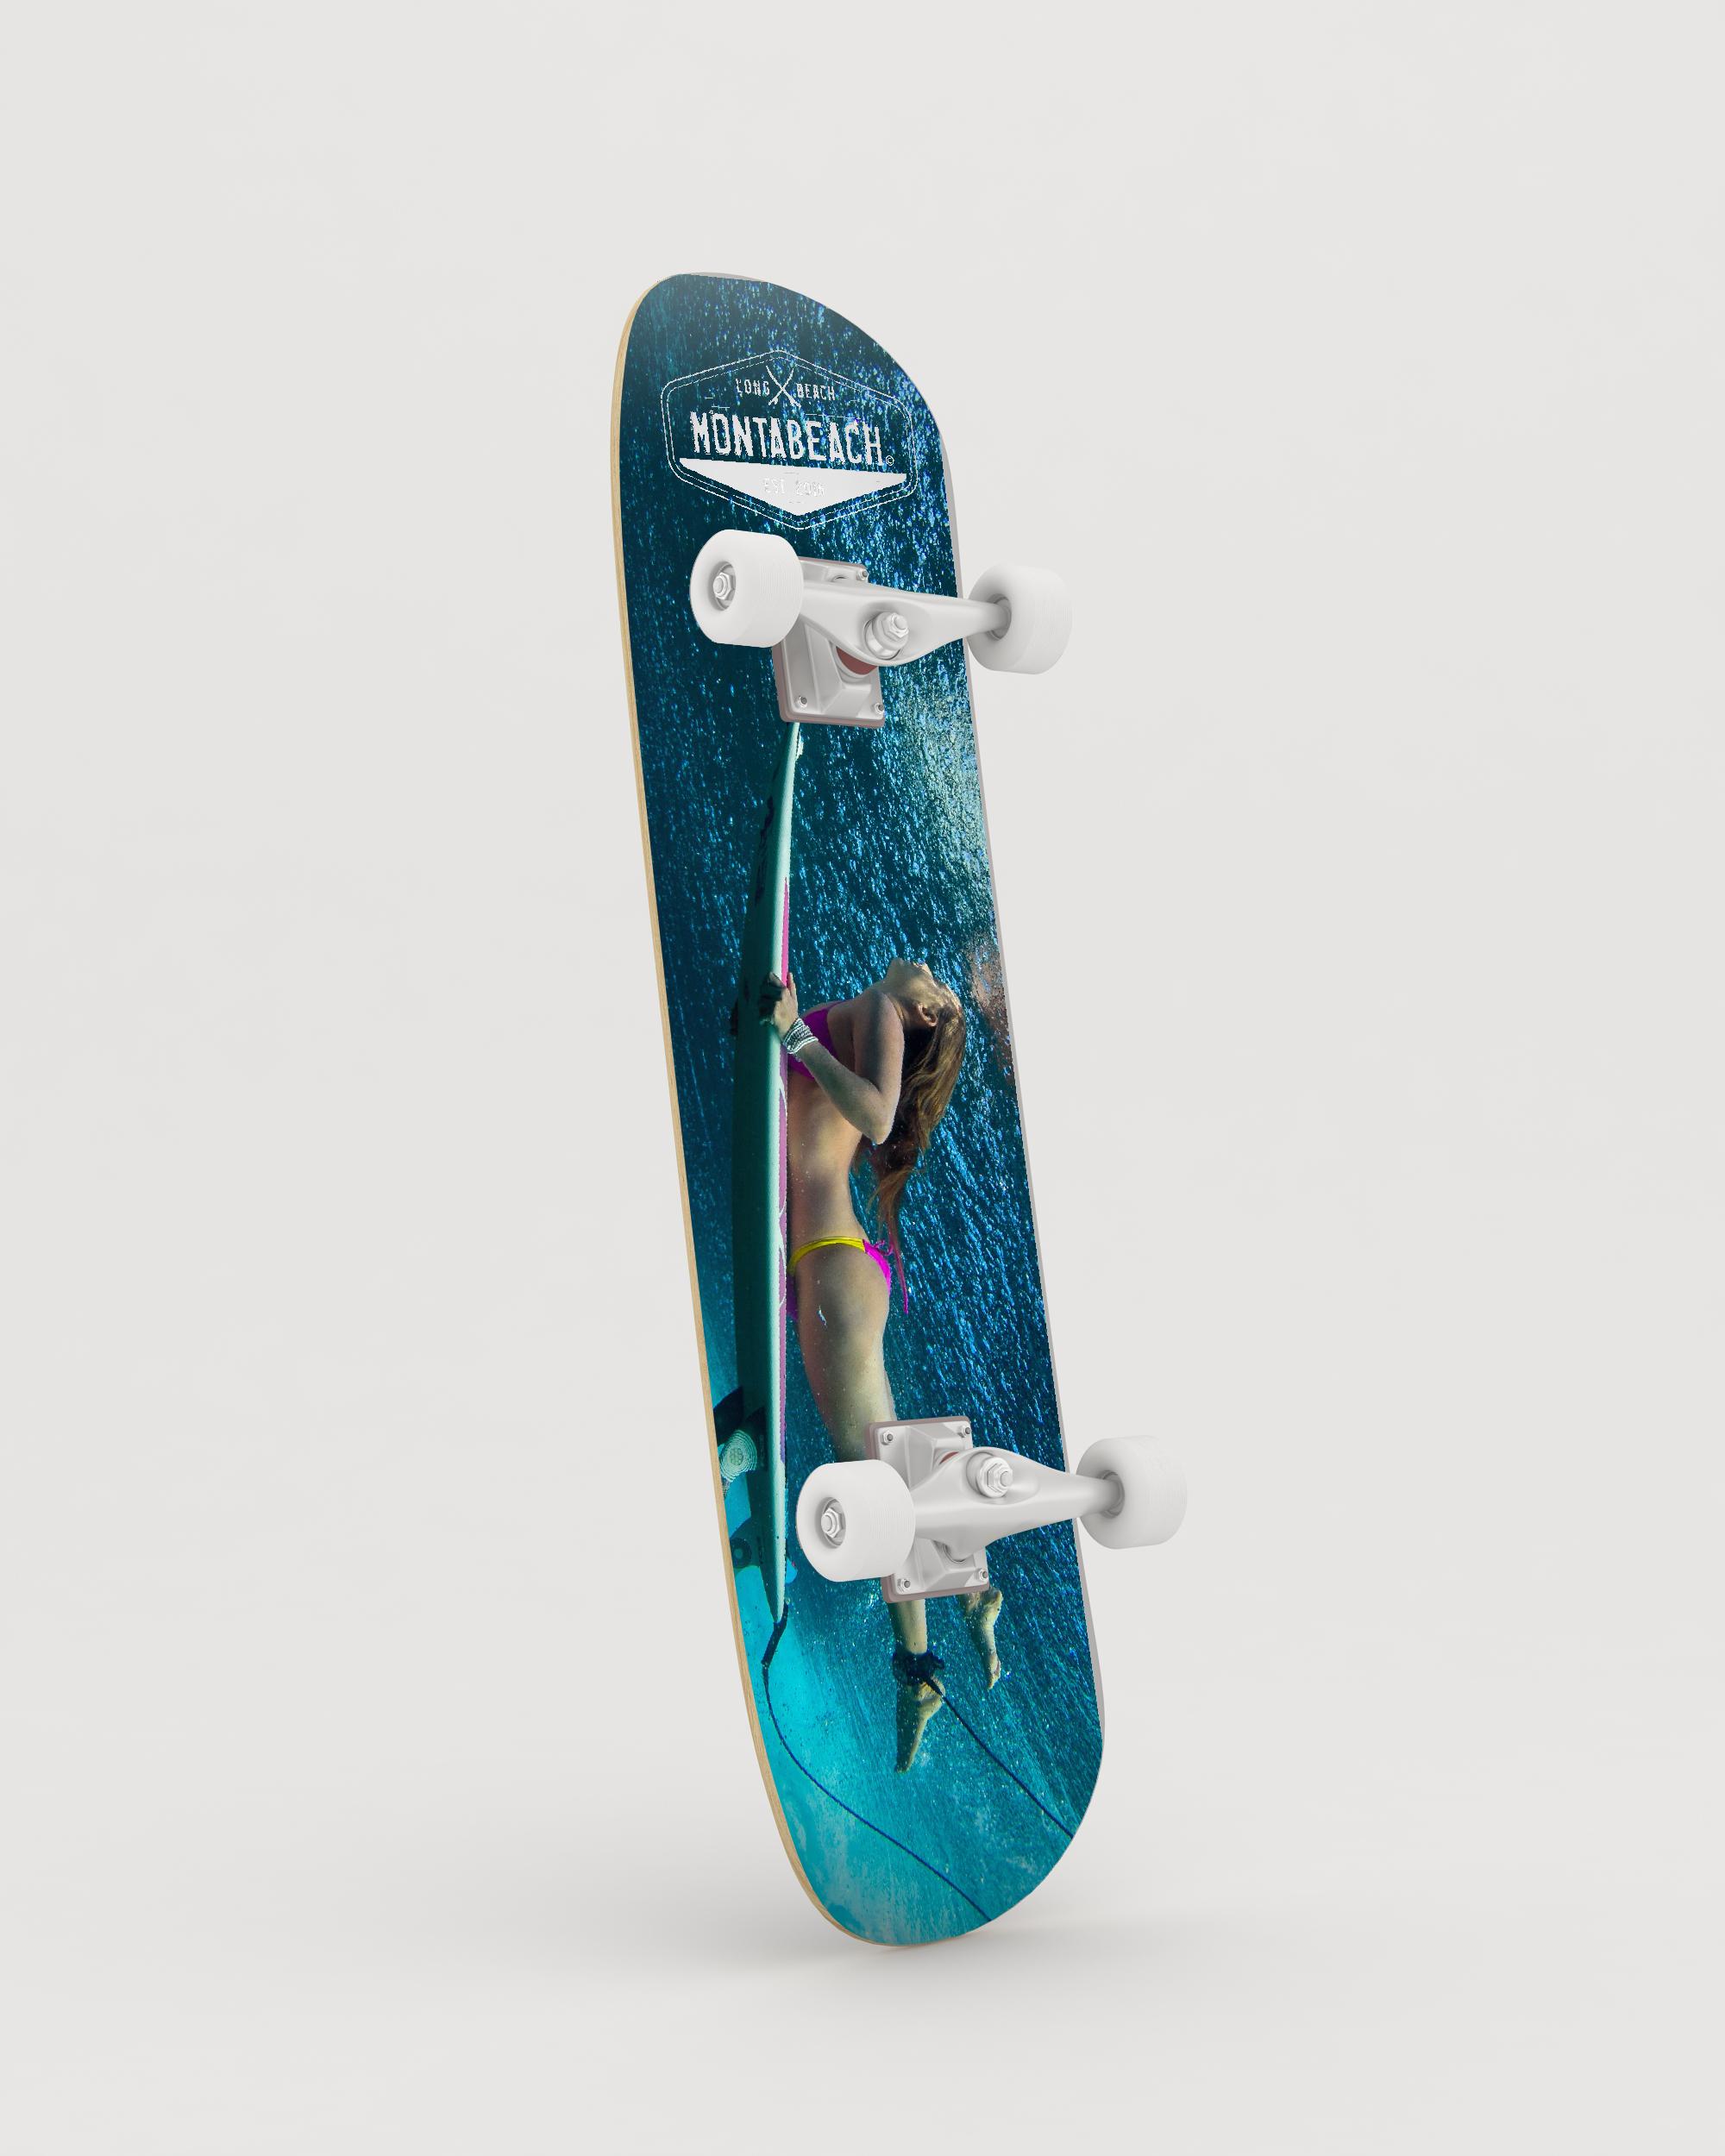 skate montabech 001 (2)